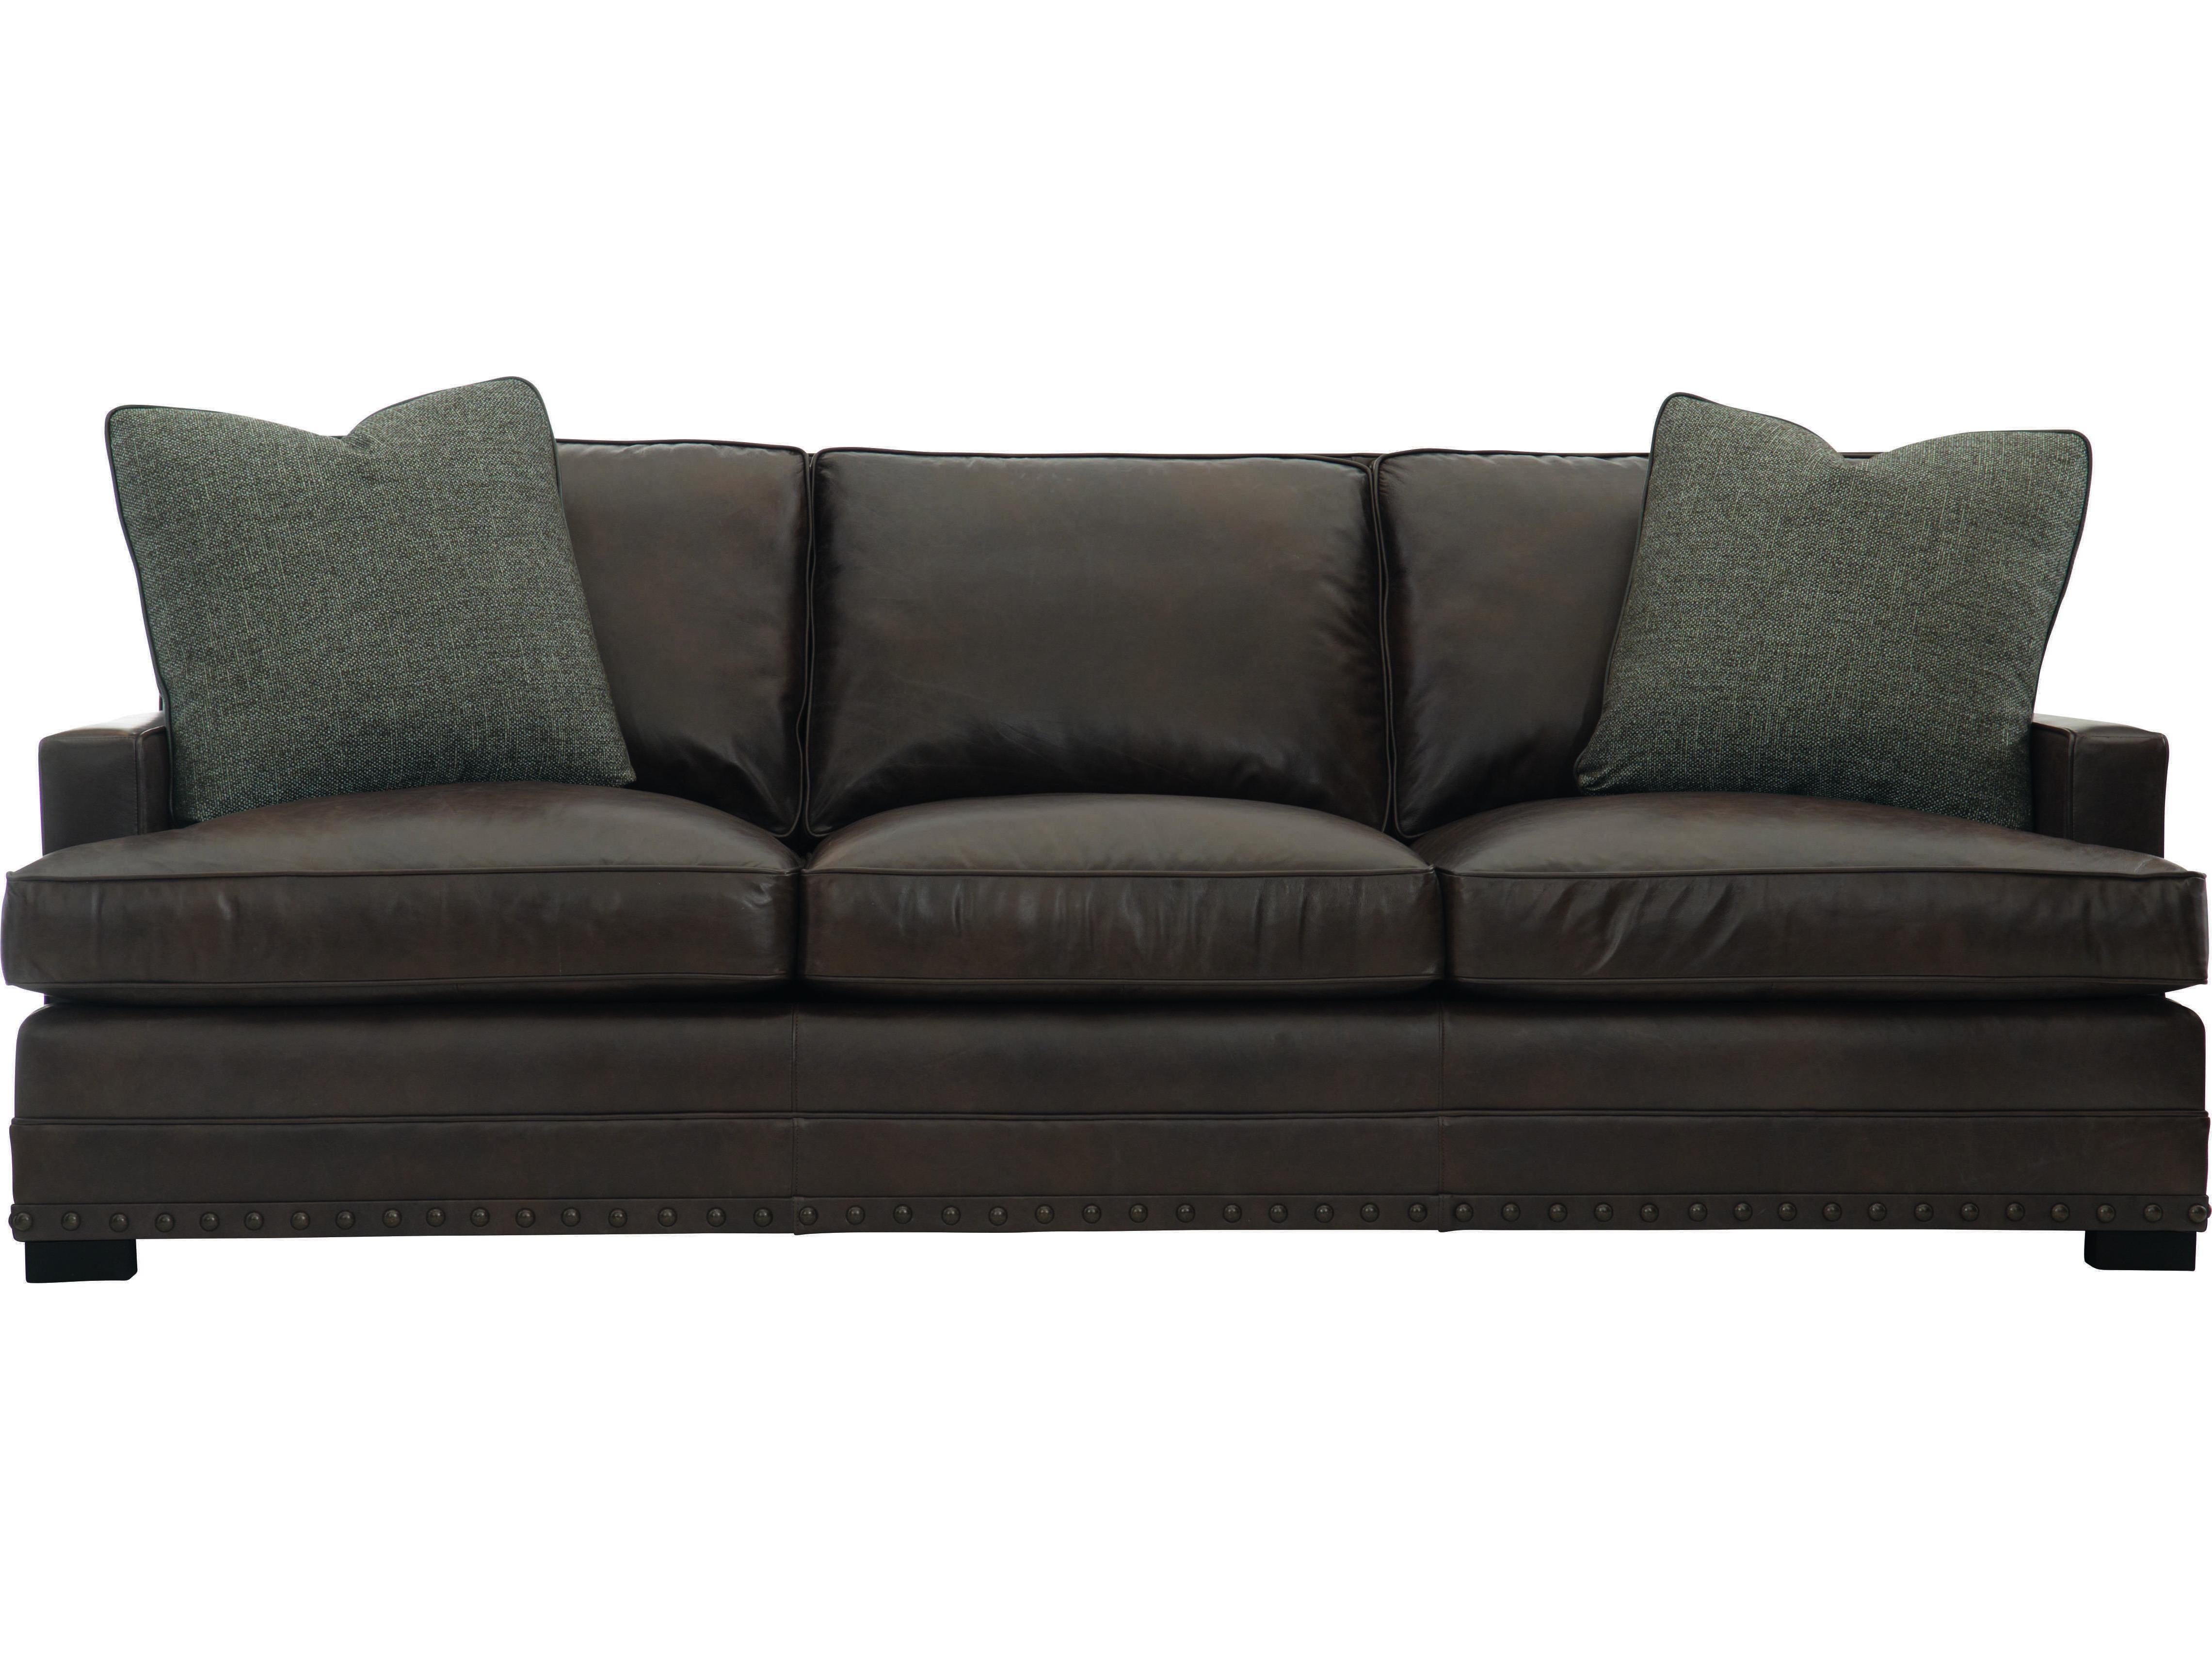 Bernhardt Cantor Mocha Sofa Couch | BH4067LTO